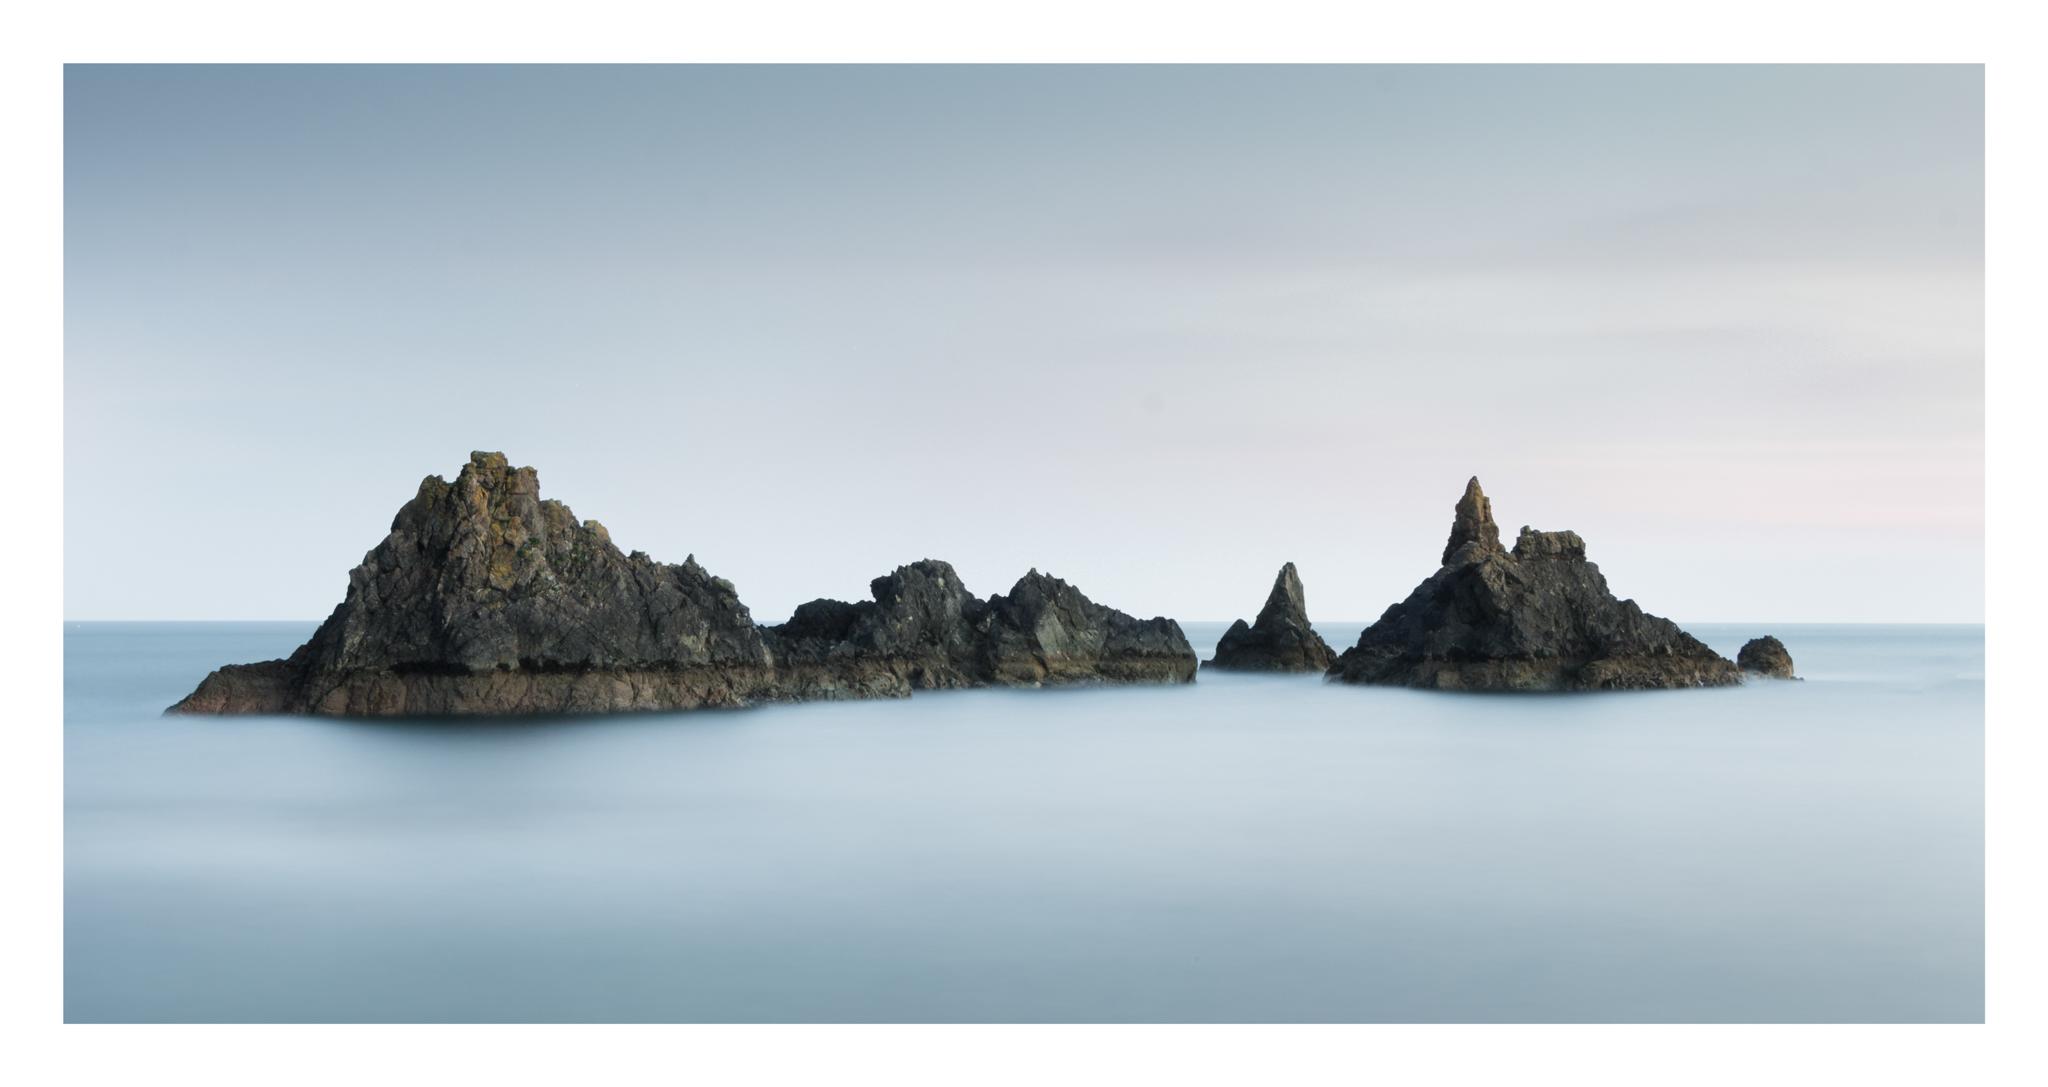 Copper Coast 21 - Kilfarrasy beach on the Copper Coast in Waterford, Ireland